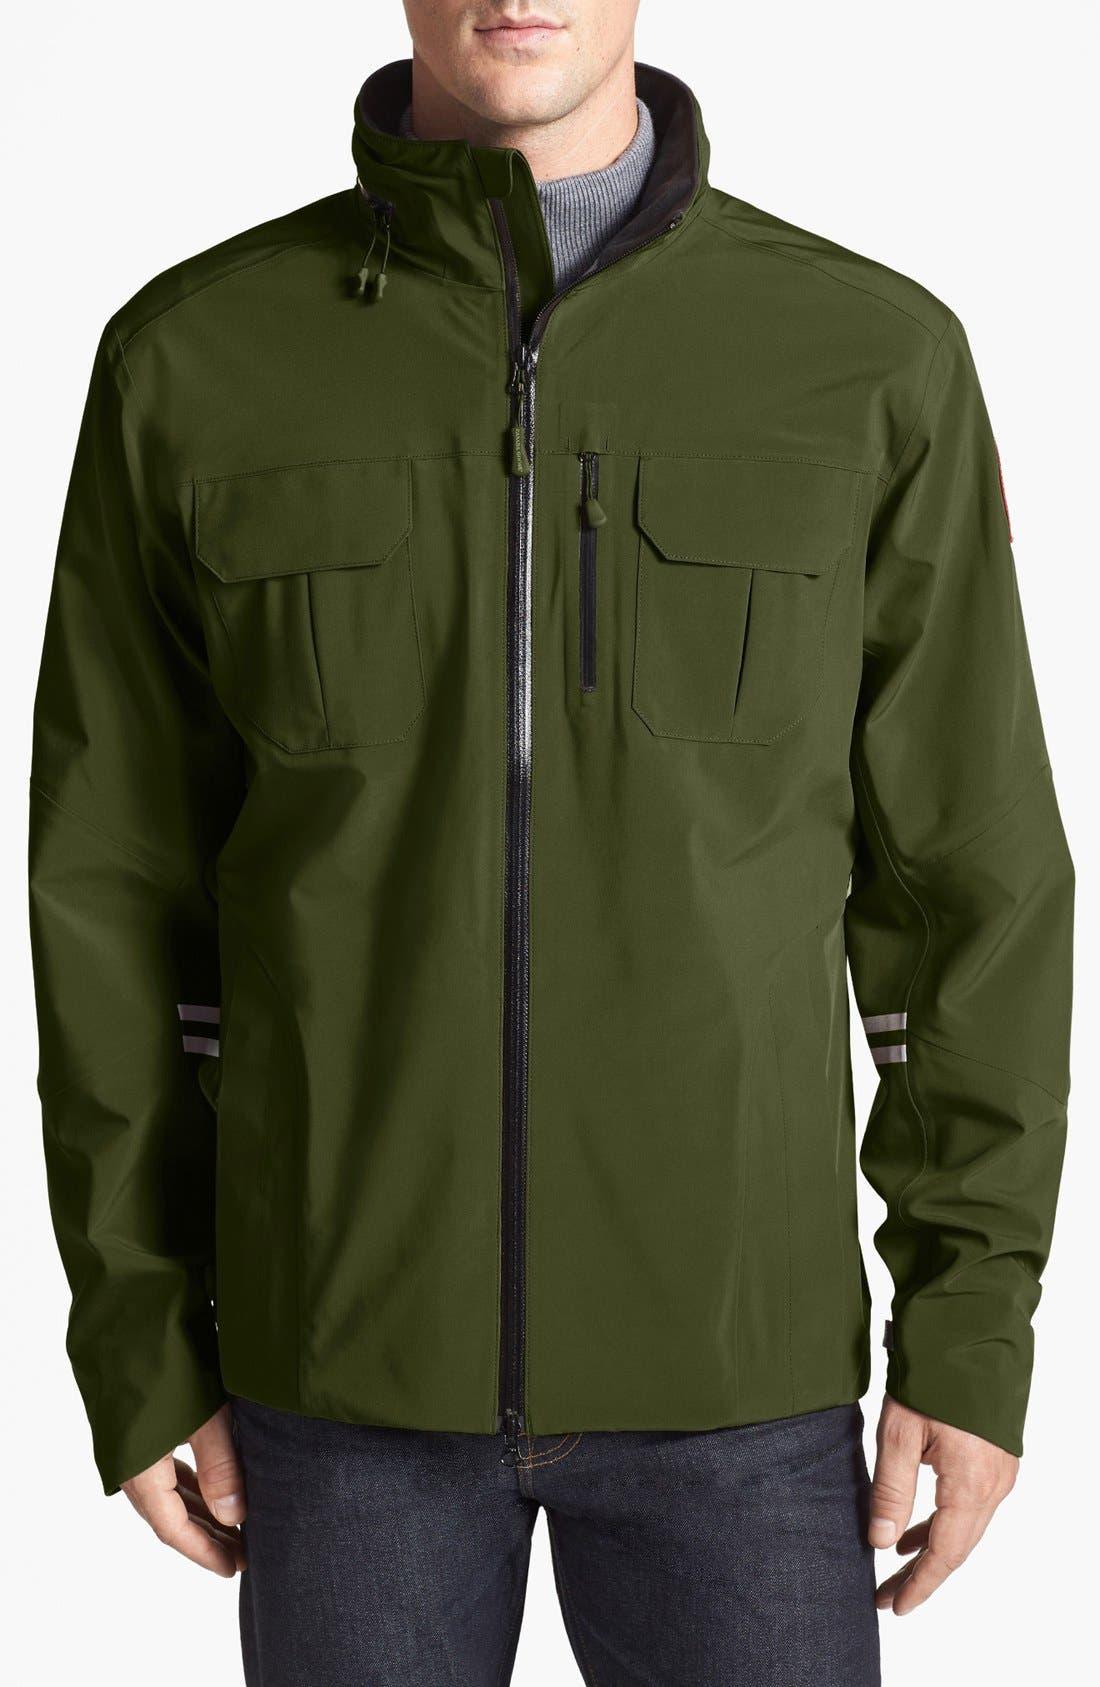 Alternate Image 1 Selected - Canada Goose 'Moraine' Jacket